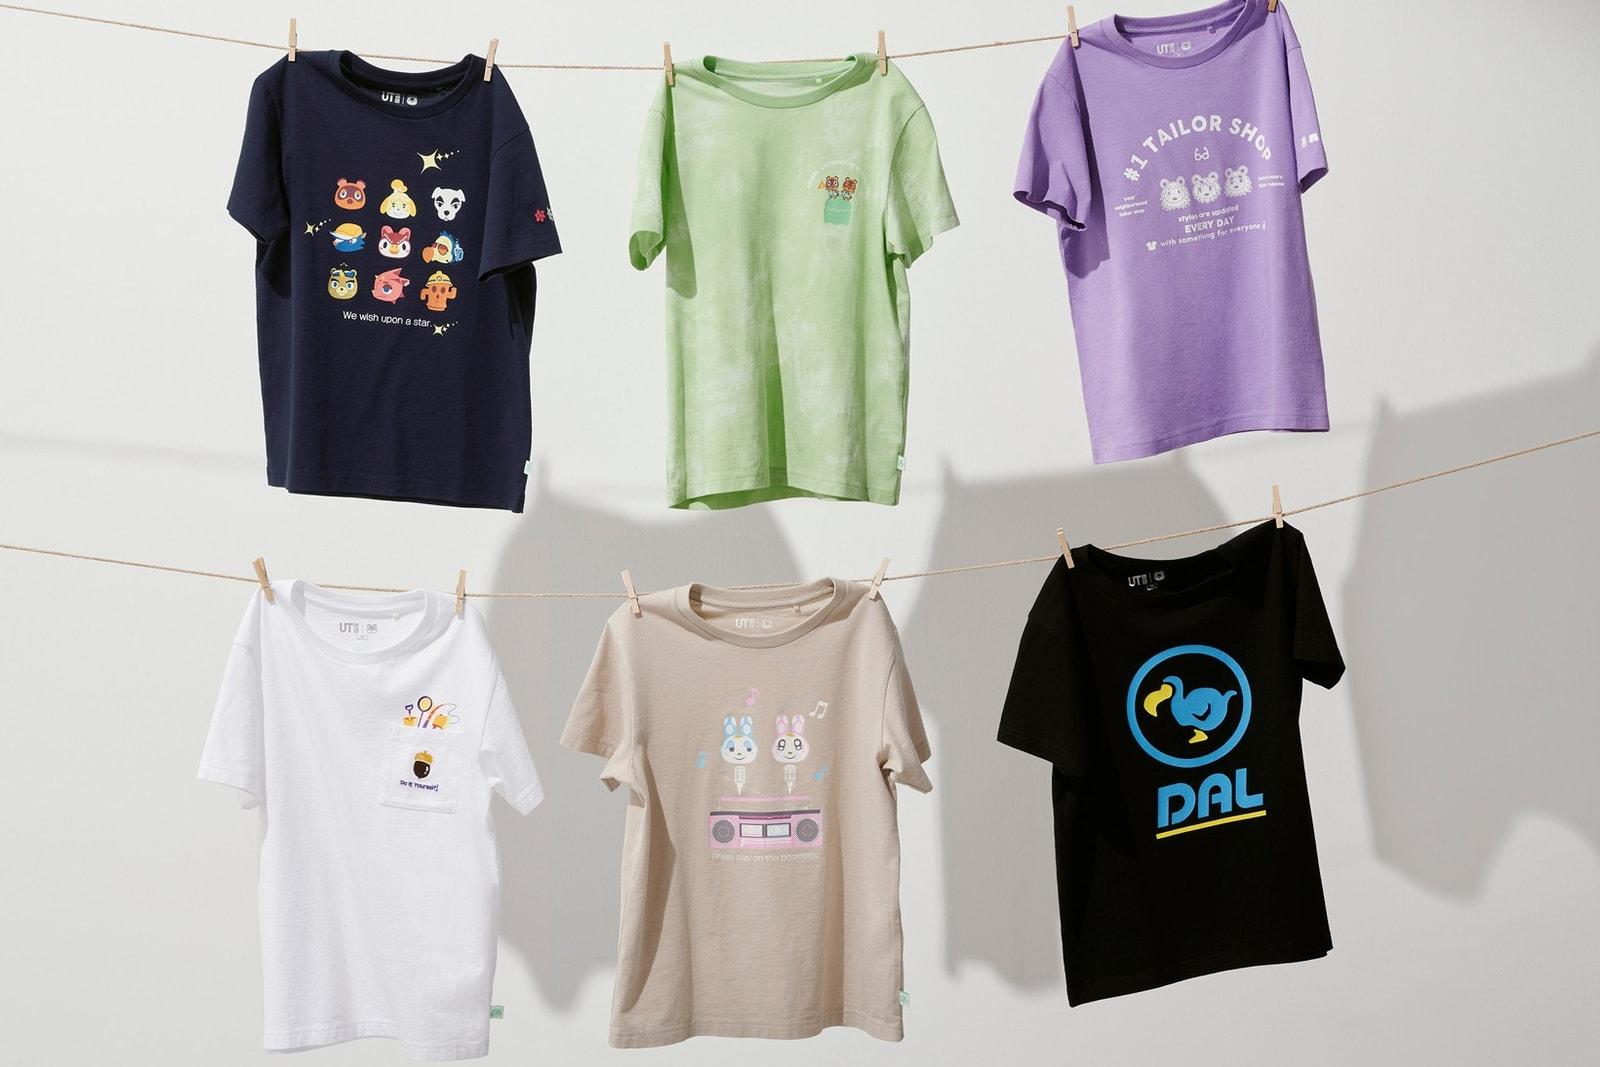 Miu Miu Levi's Denim Jeans Collaboration Collection Vintage